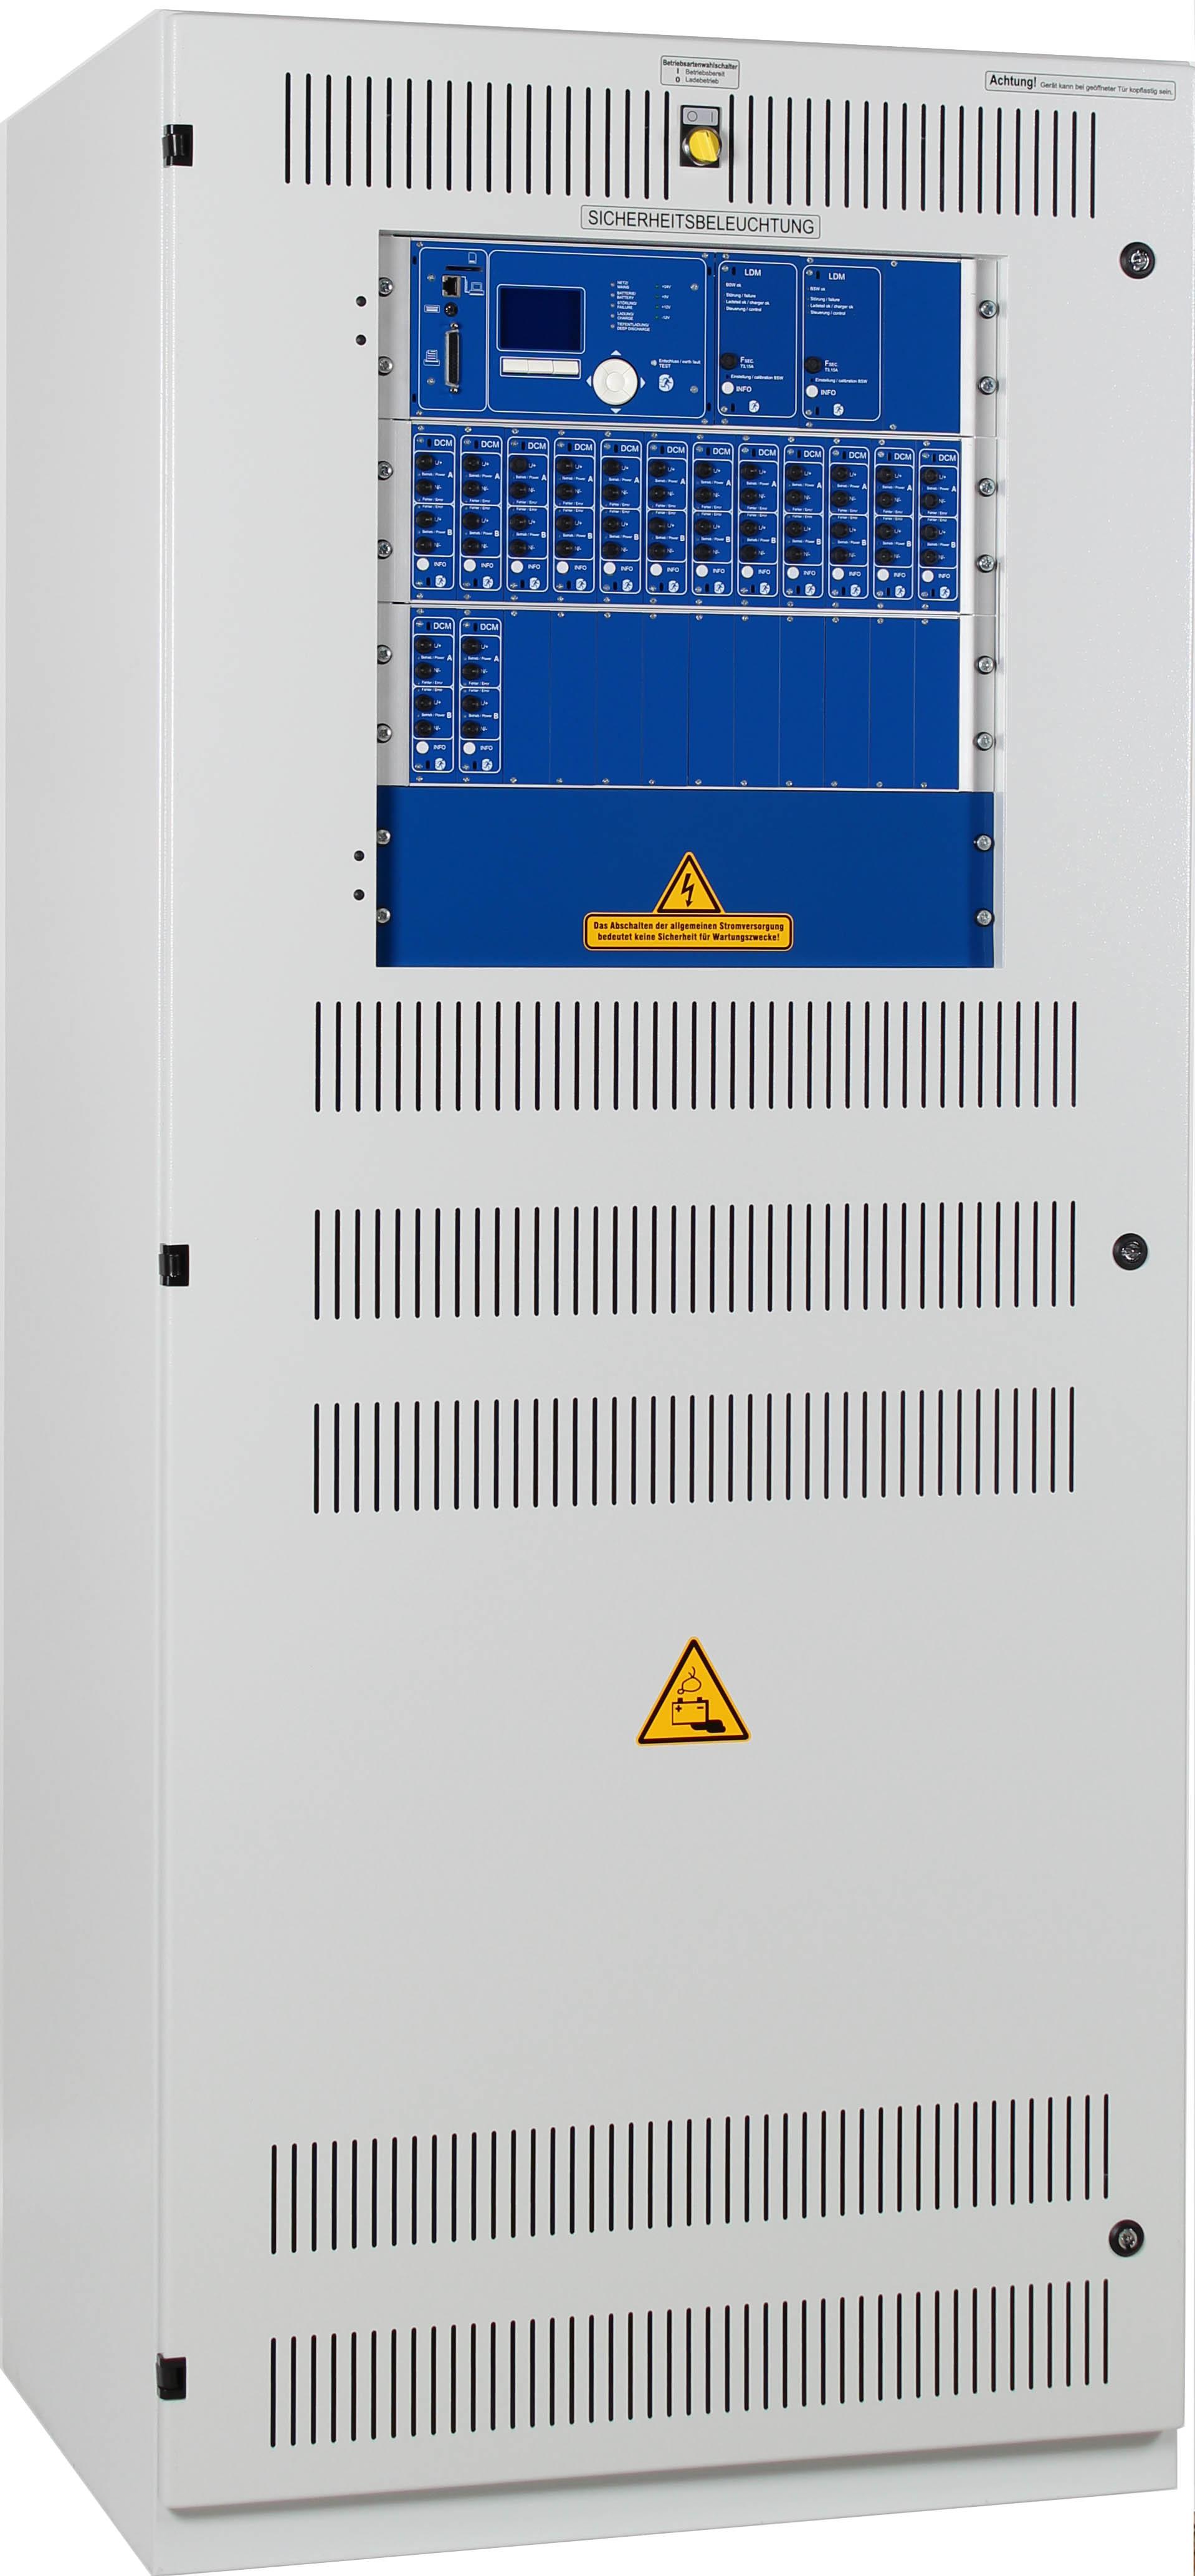 1 Stk Zentralbatterieanlage MaxiControl, 60/5A, ohne DCM NLMCX260--